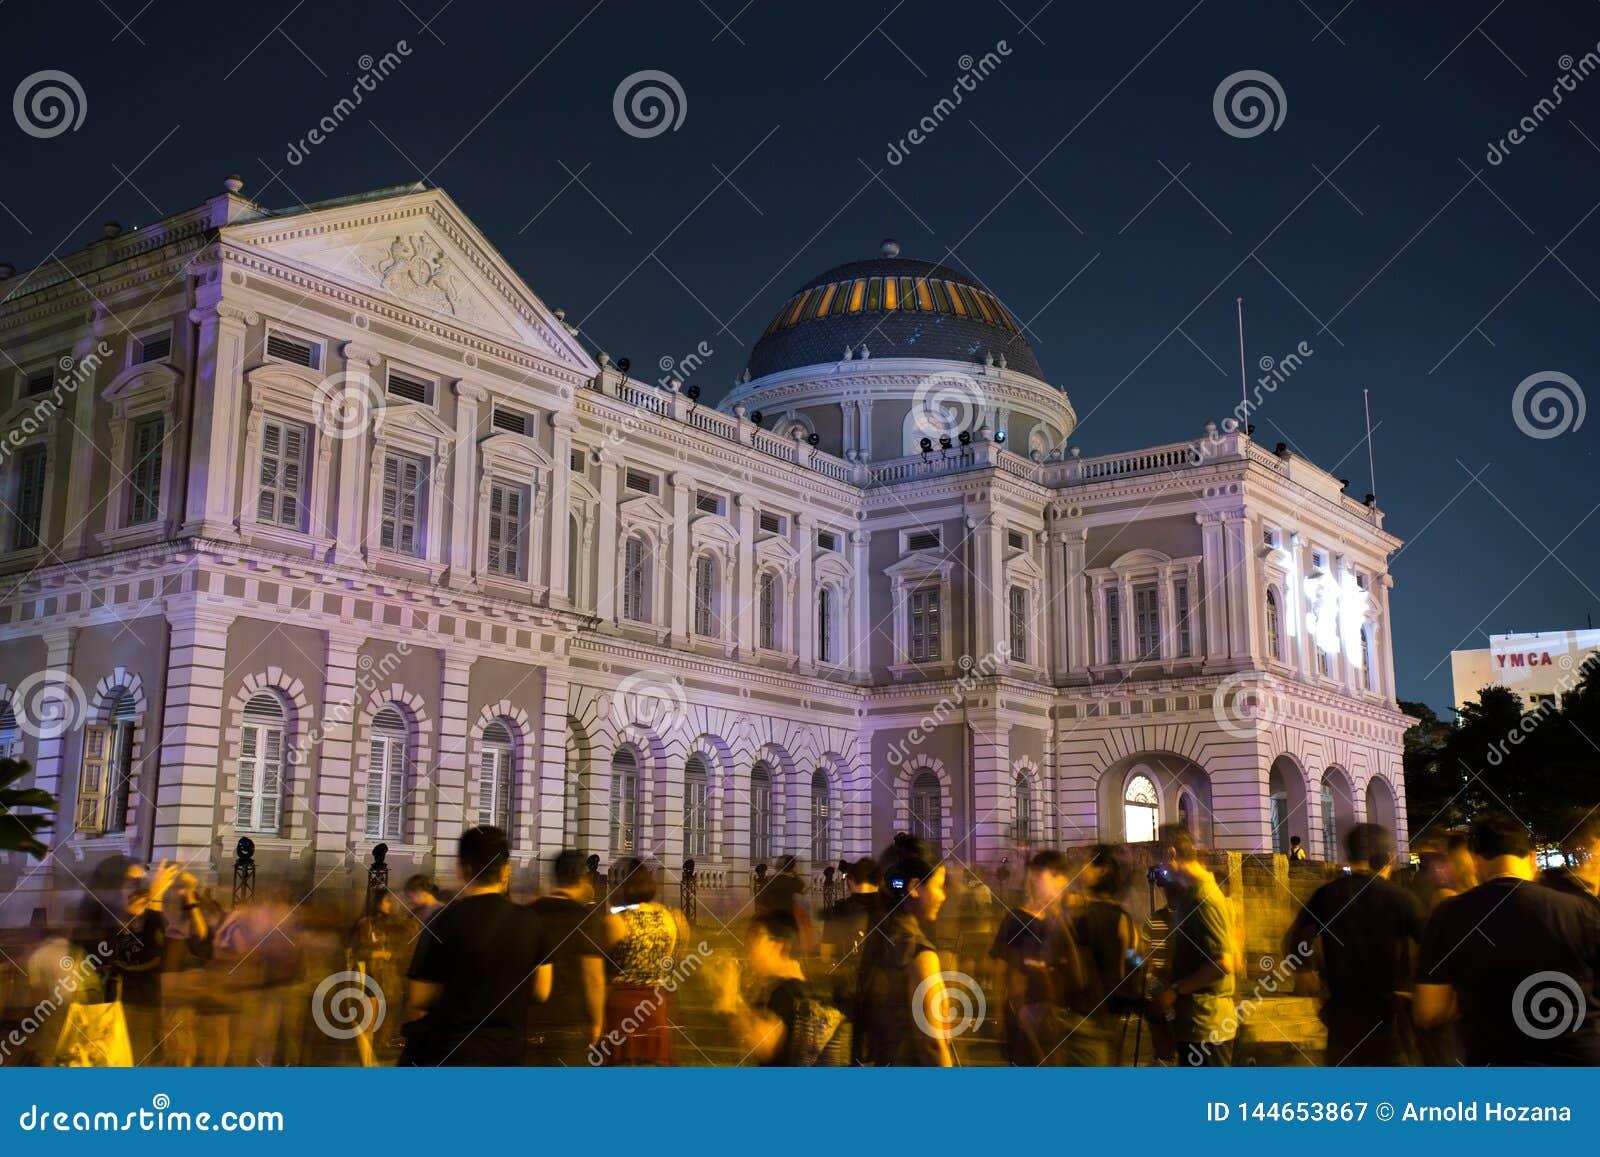 Музей Сингапура - фестиваль ночи